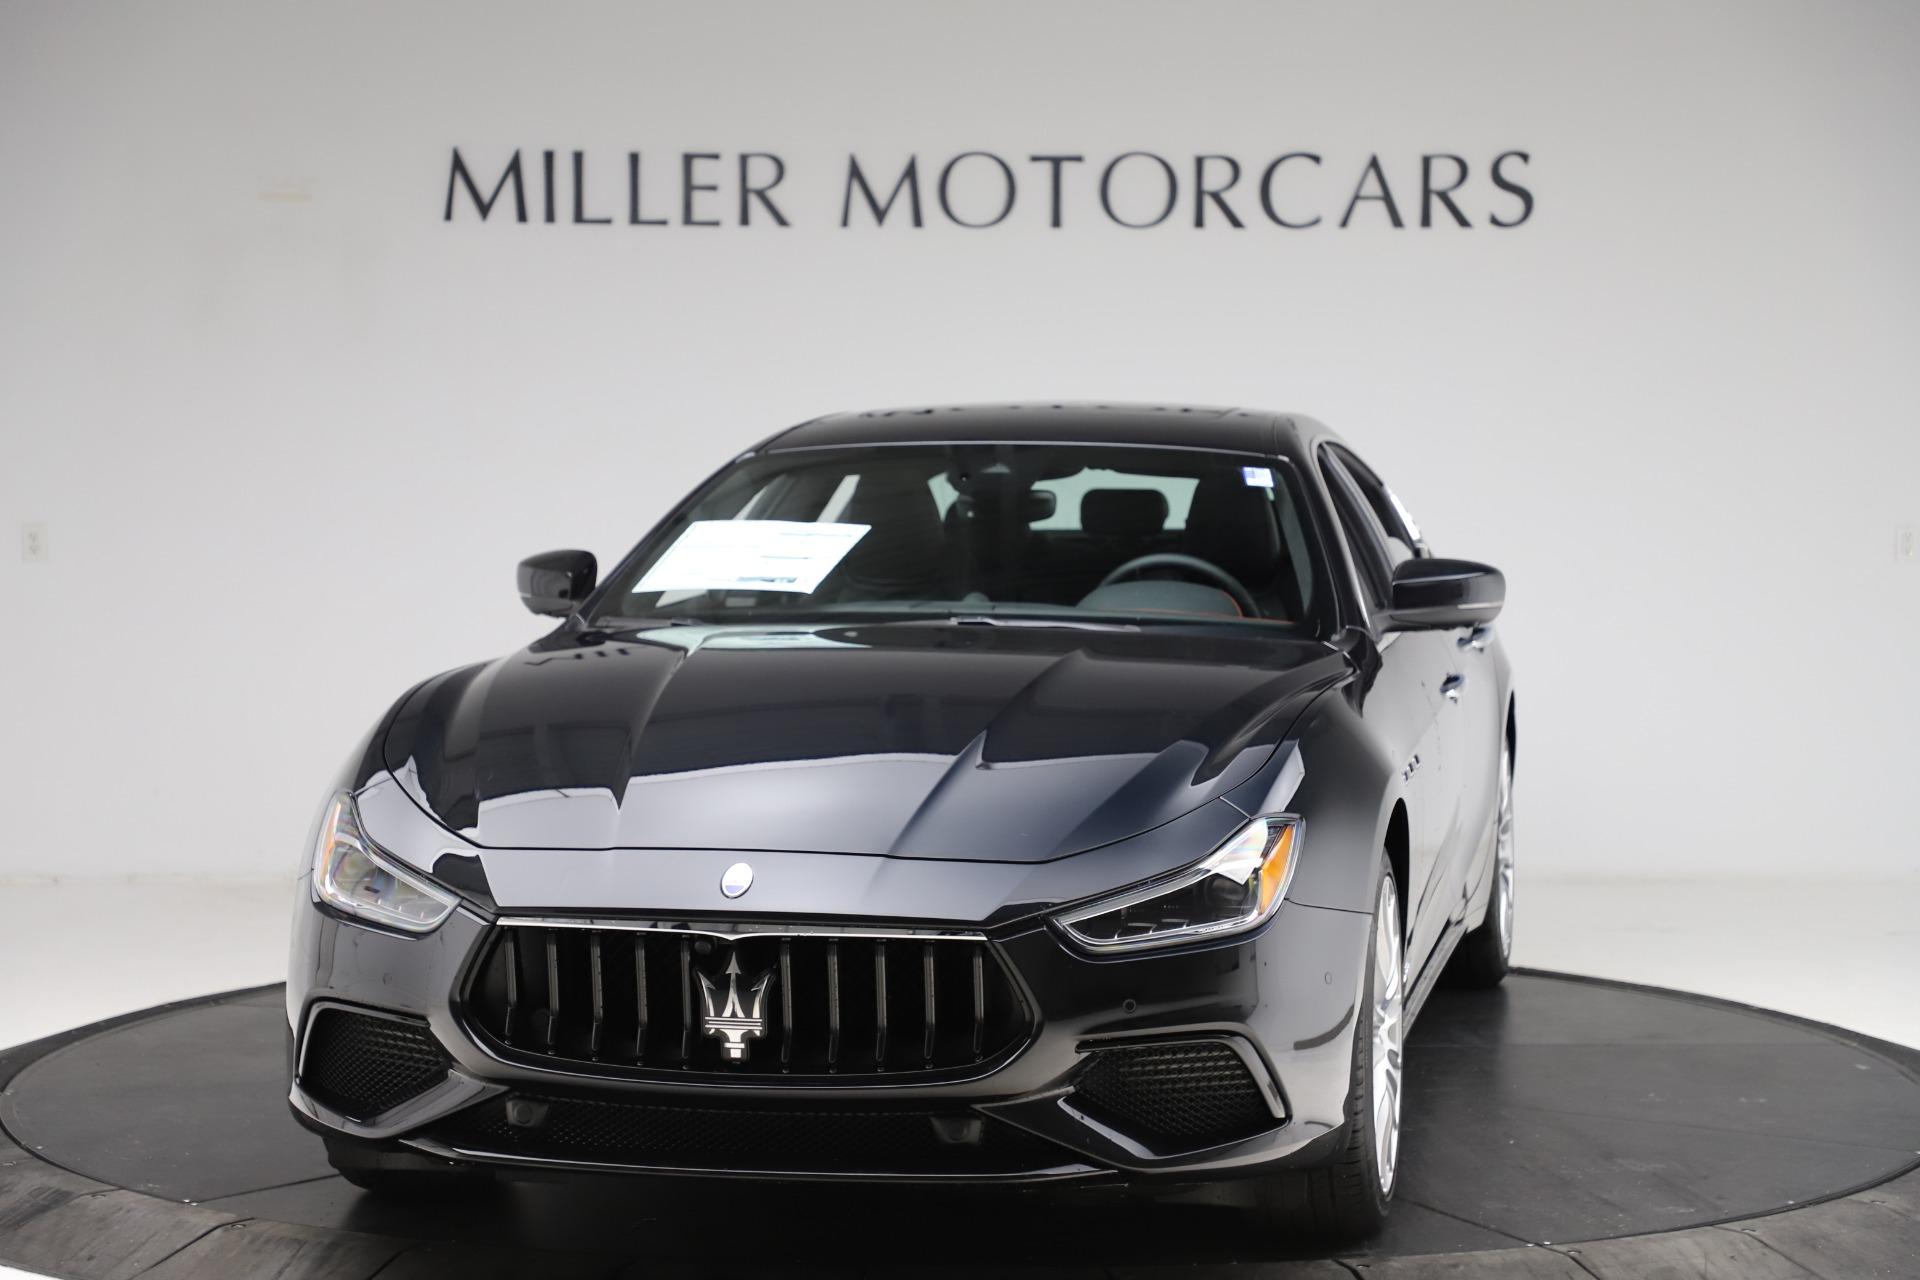 New 2021 Maserati Ghibli S Q4 GranSport for sale $98,035 at McLaren Greenwich in Greenwich CT 06830 1